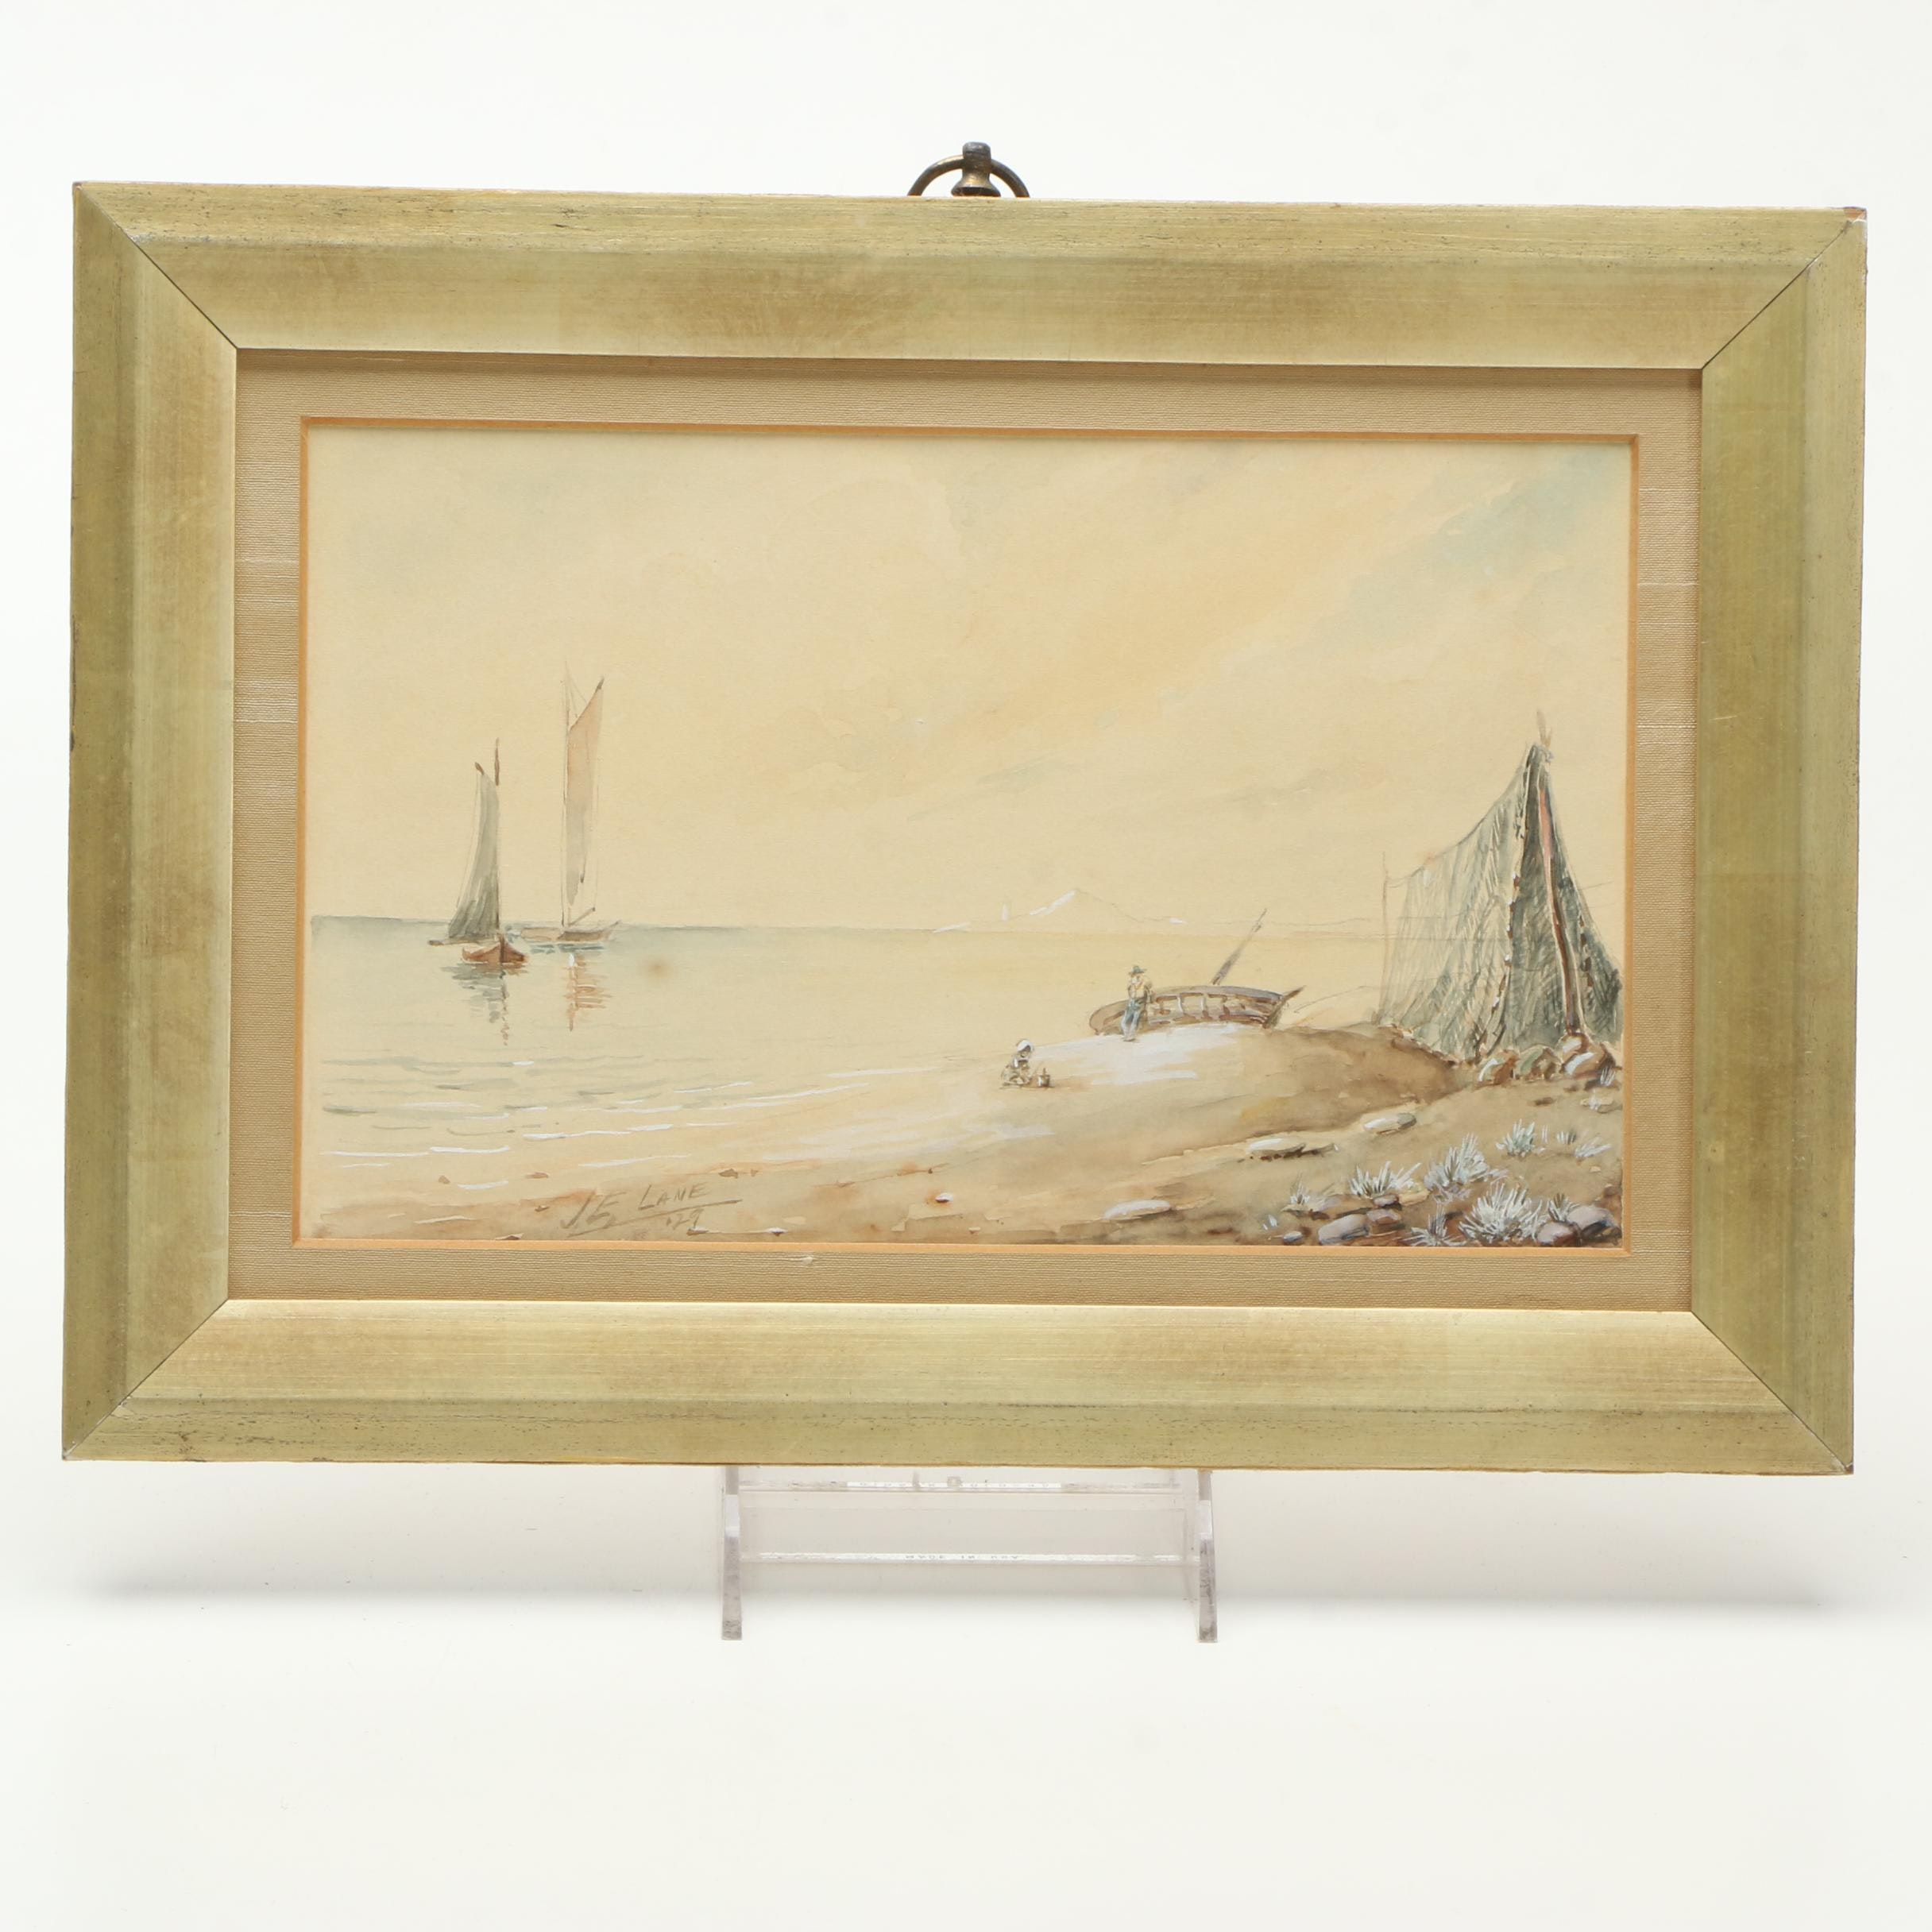 J. E. Lane 1929 Watercolor Painting on Paper of Maritime Landscape